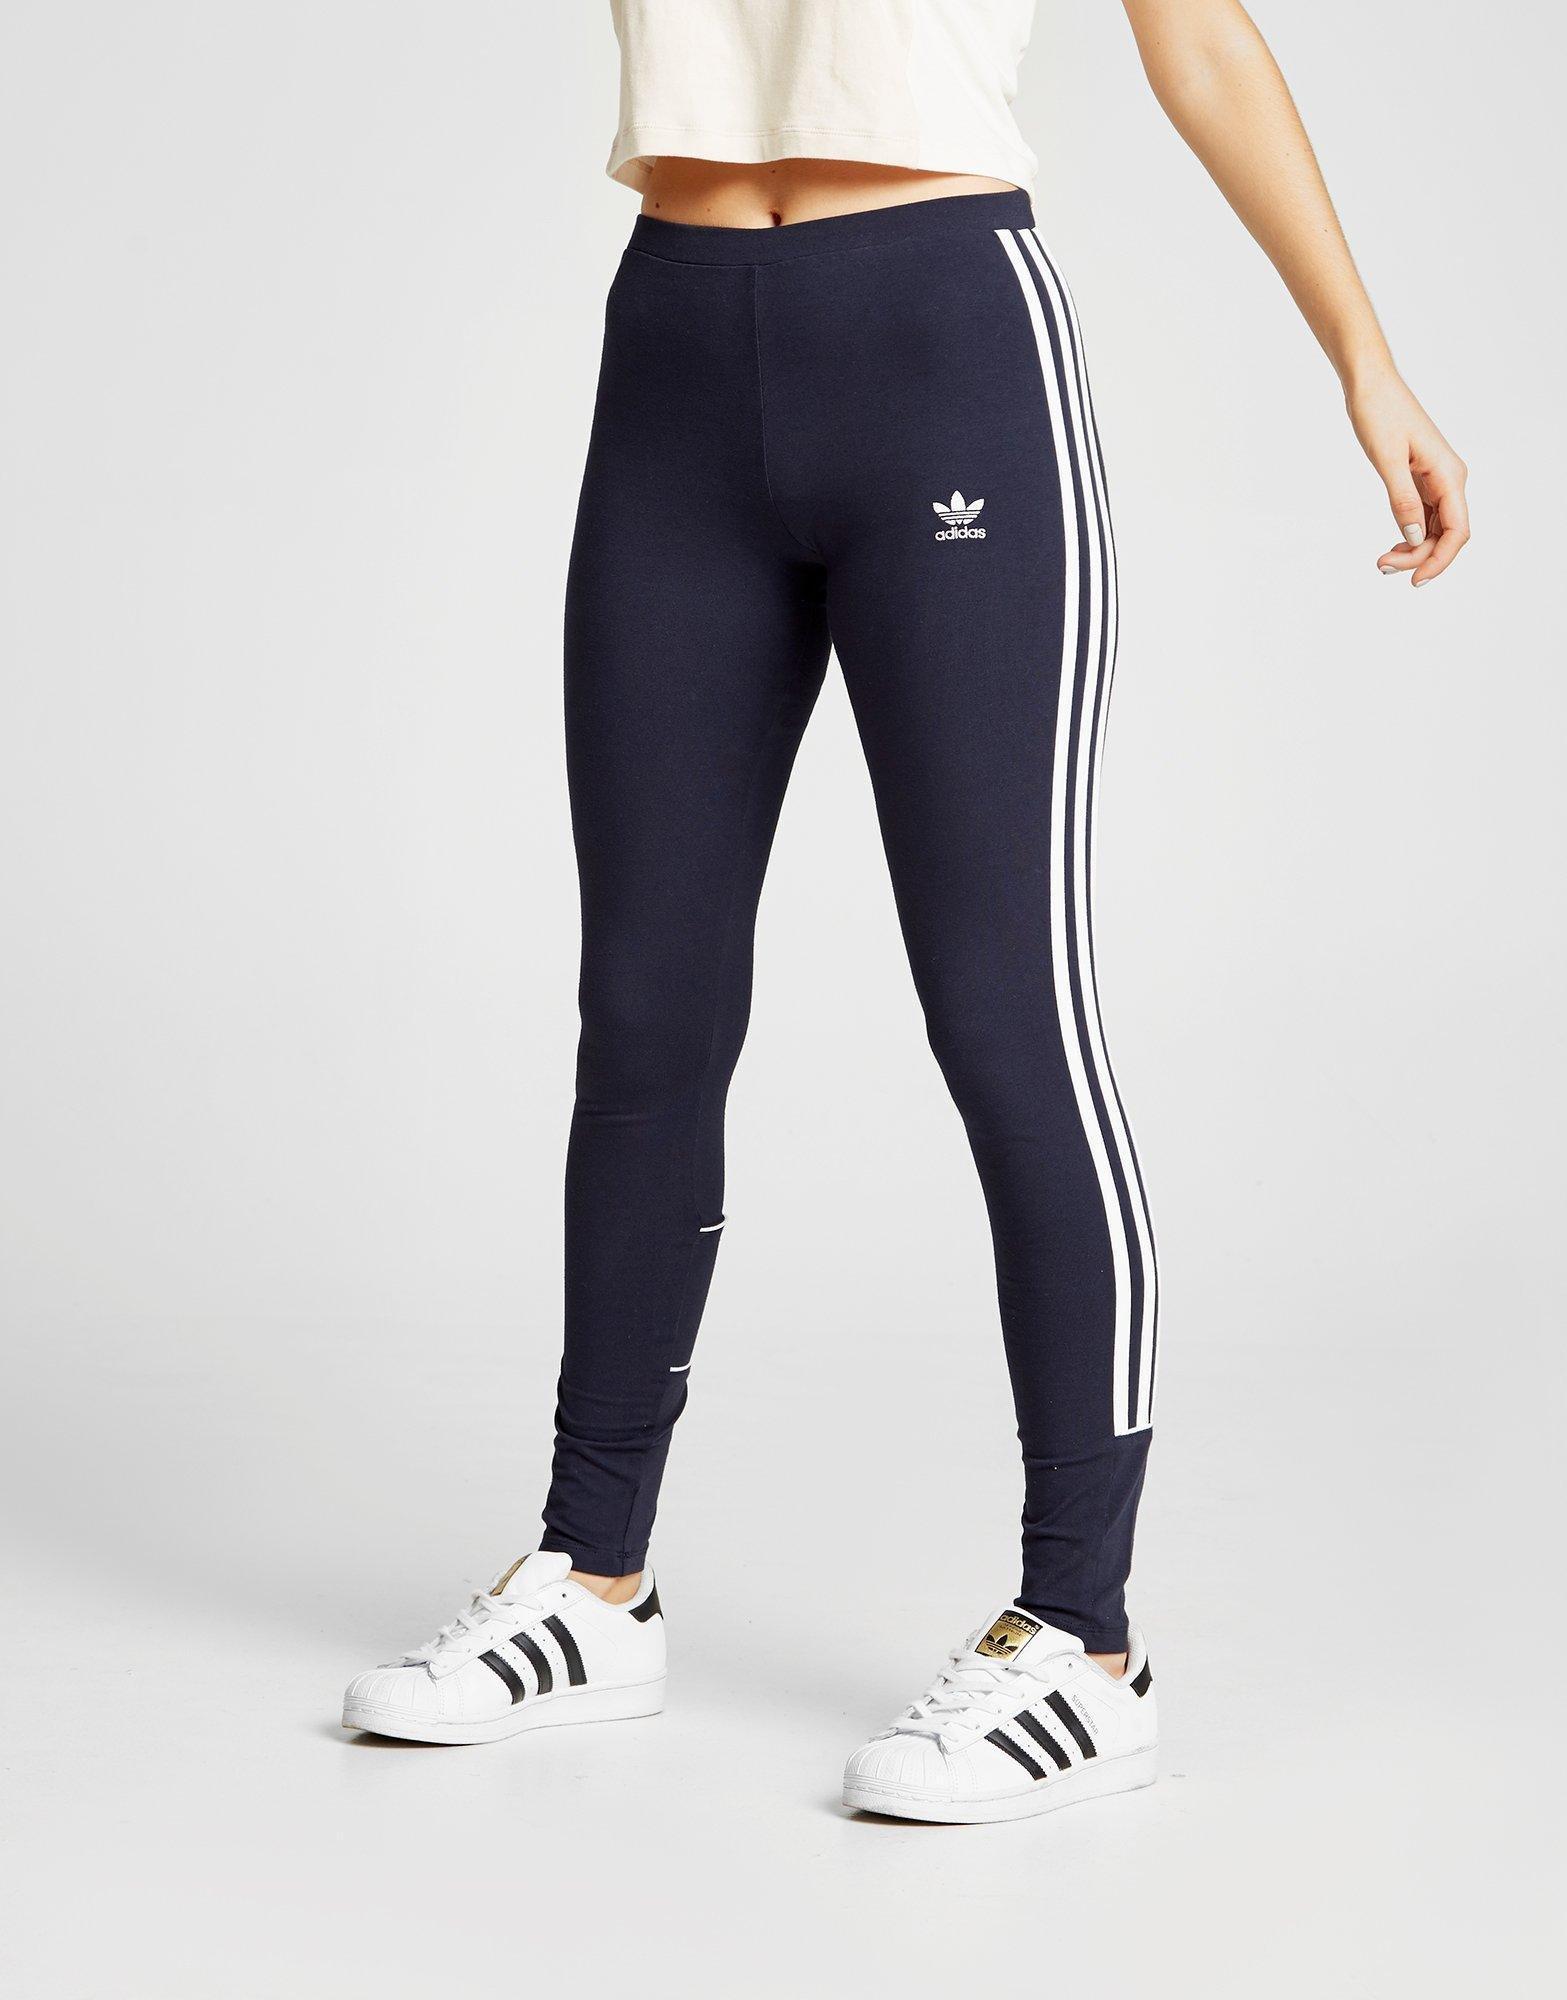 wide range sale usa online promo codes 3-stripes Piping Leggings